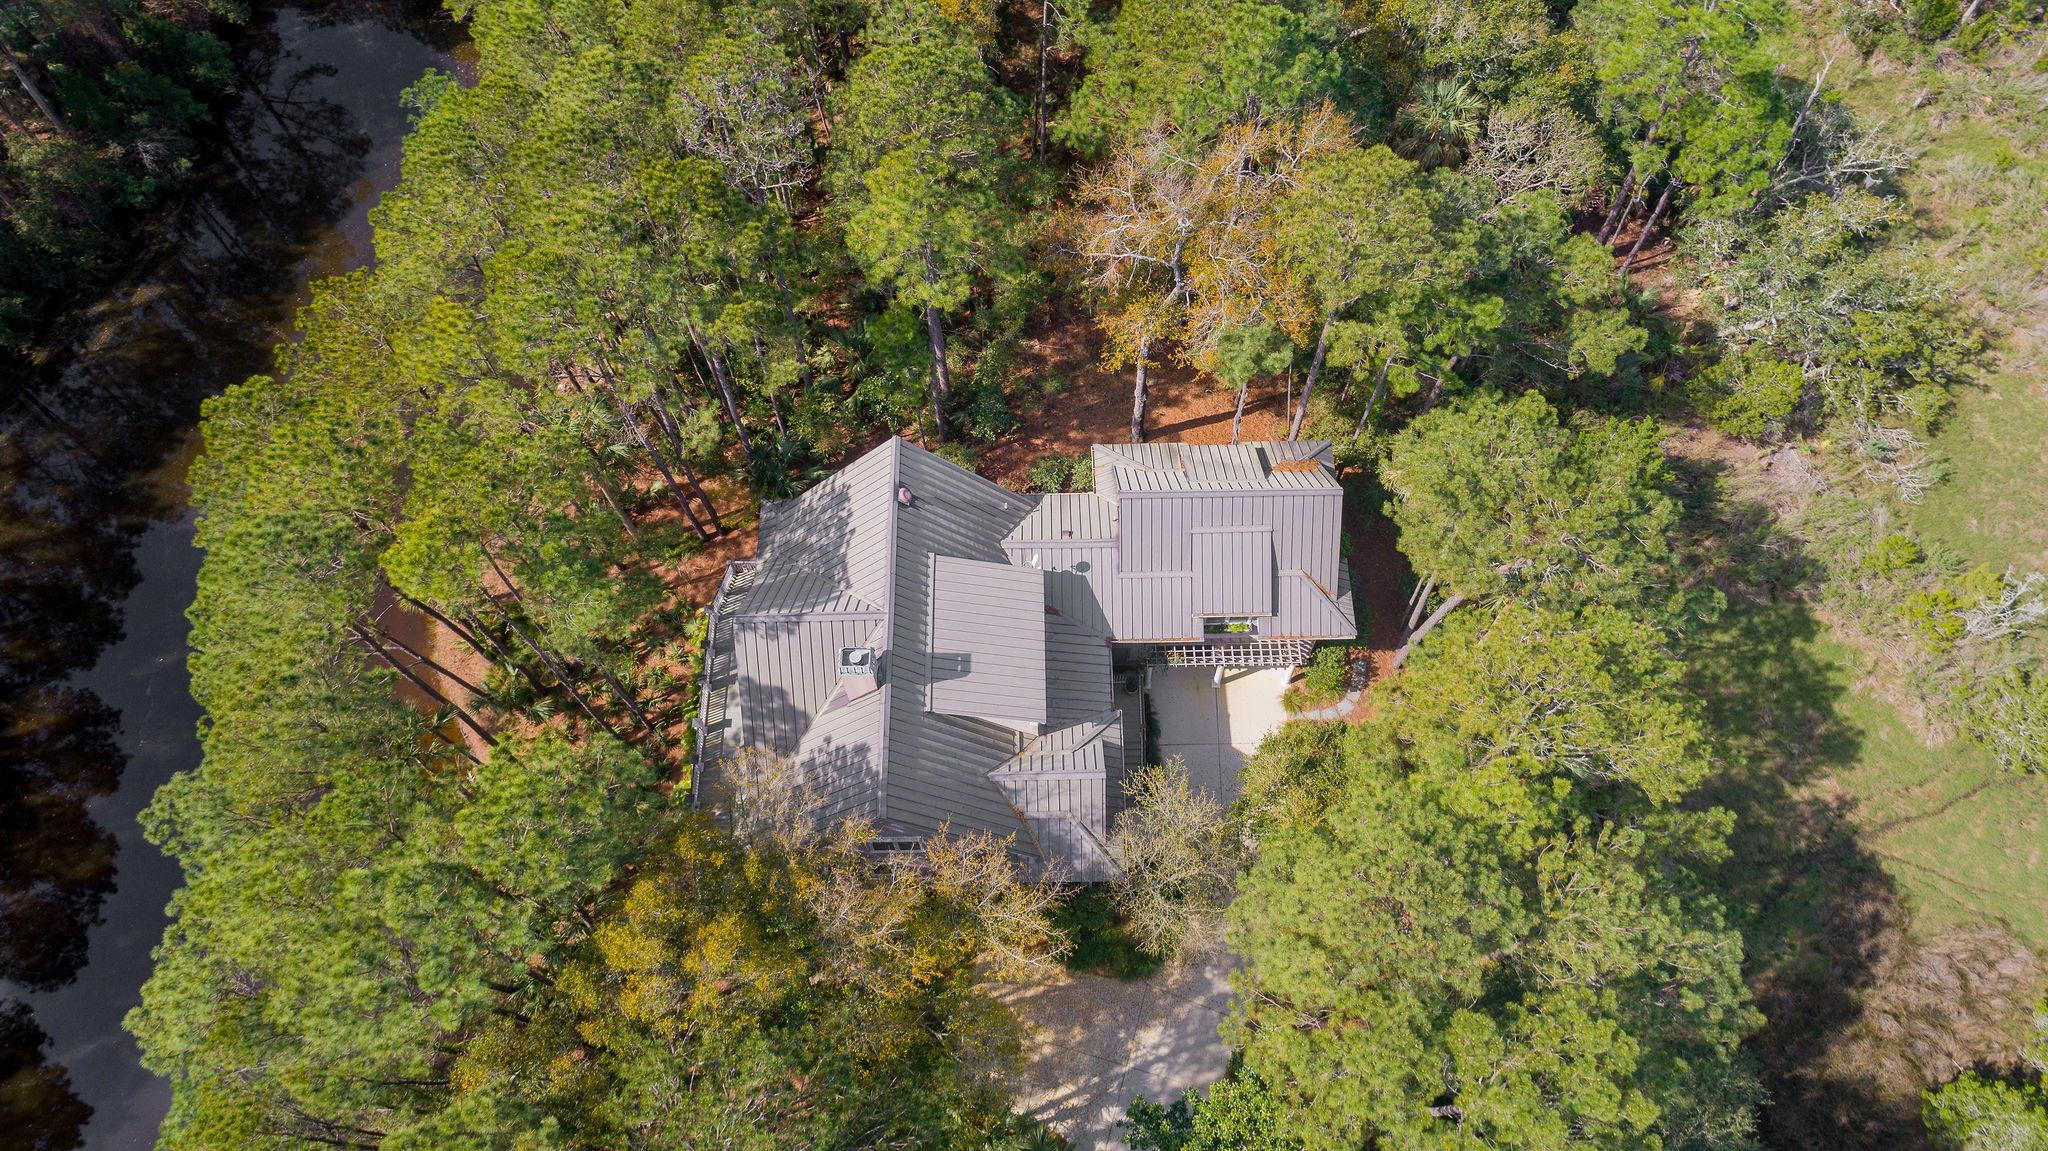 Kiawah Island Homes For Sale - 3 Grey Widgeon, Kiawah Island, SC - 75